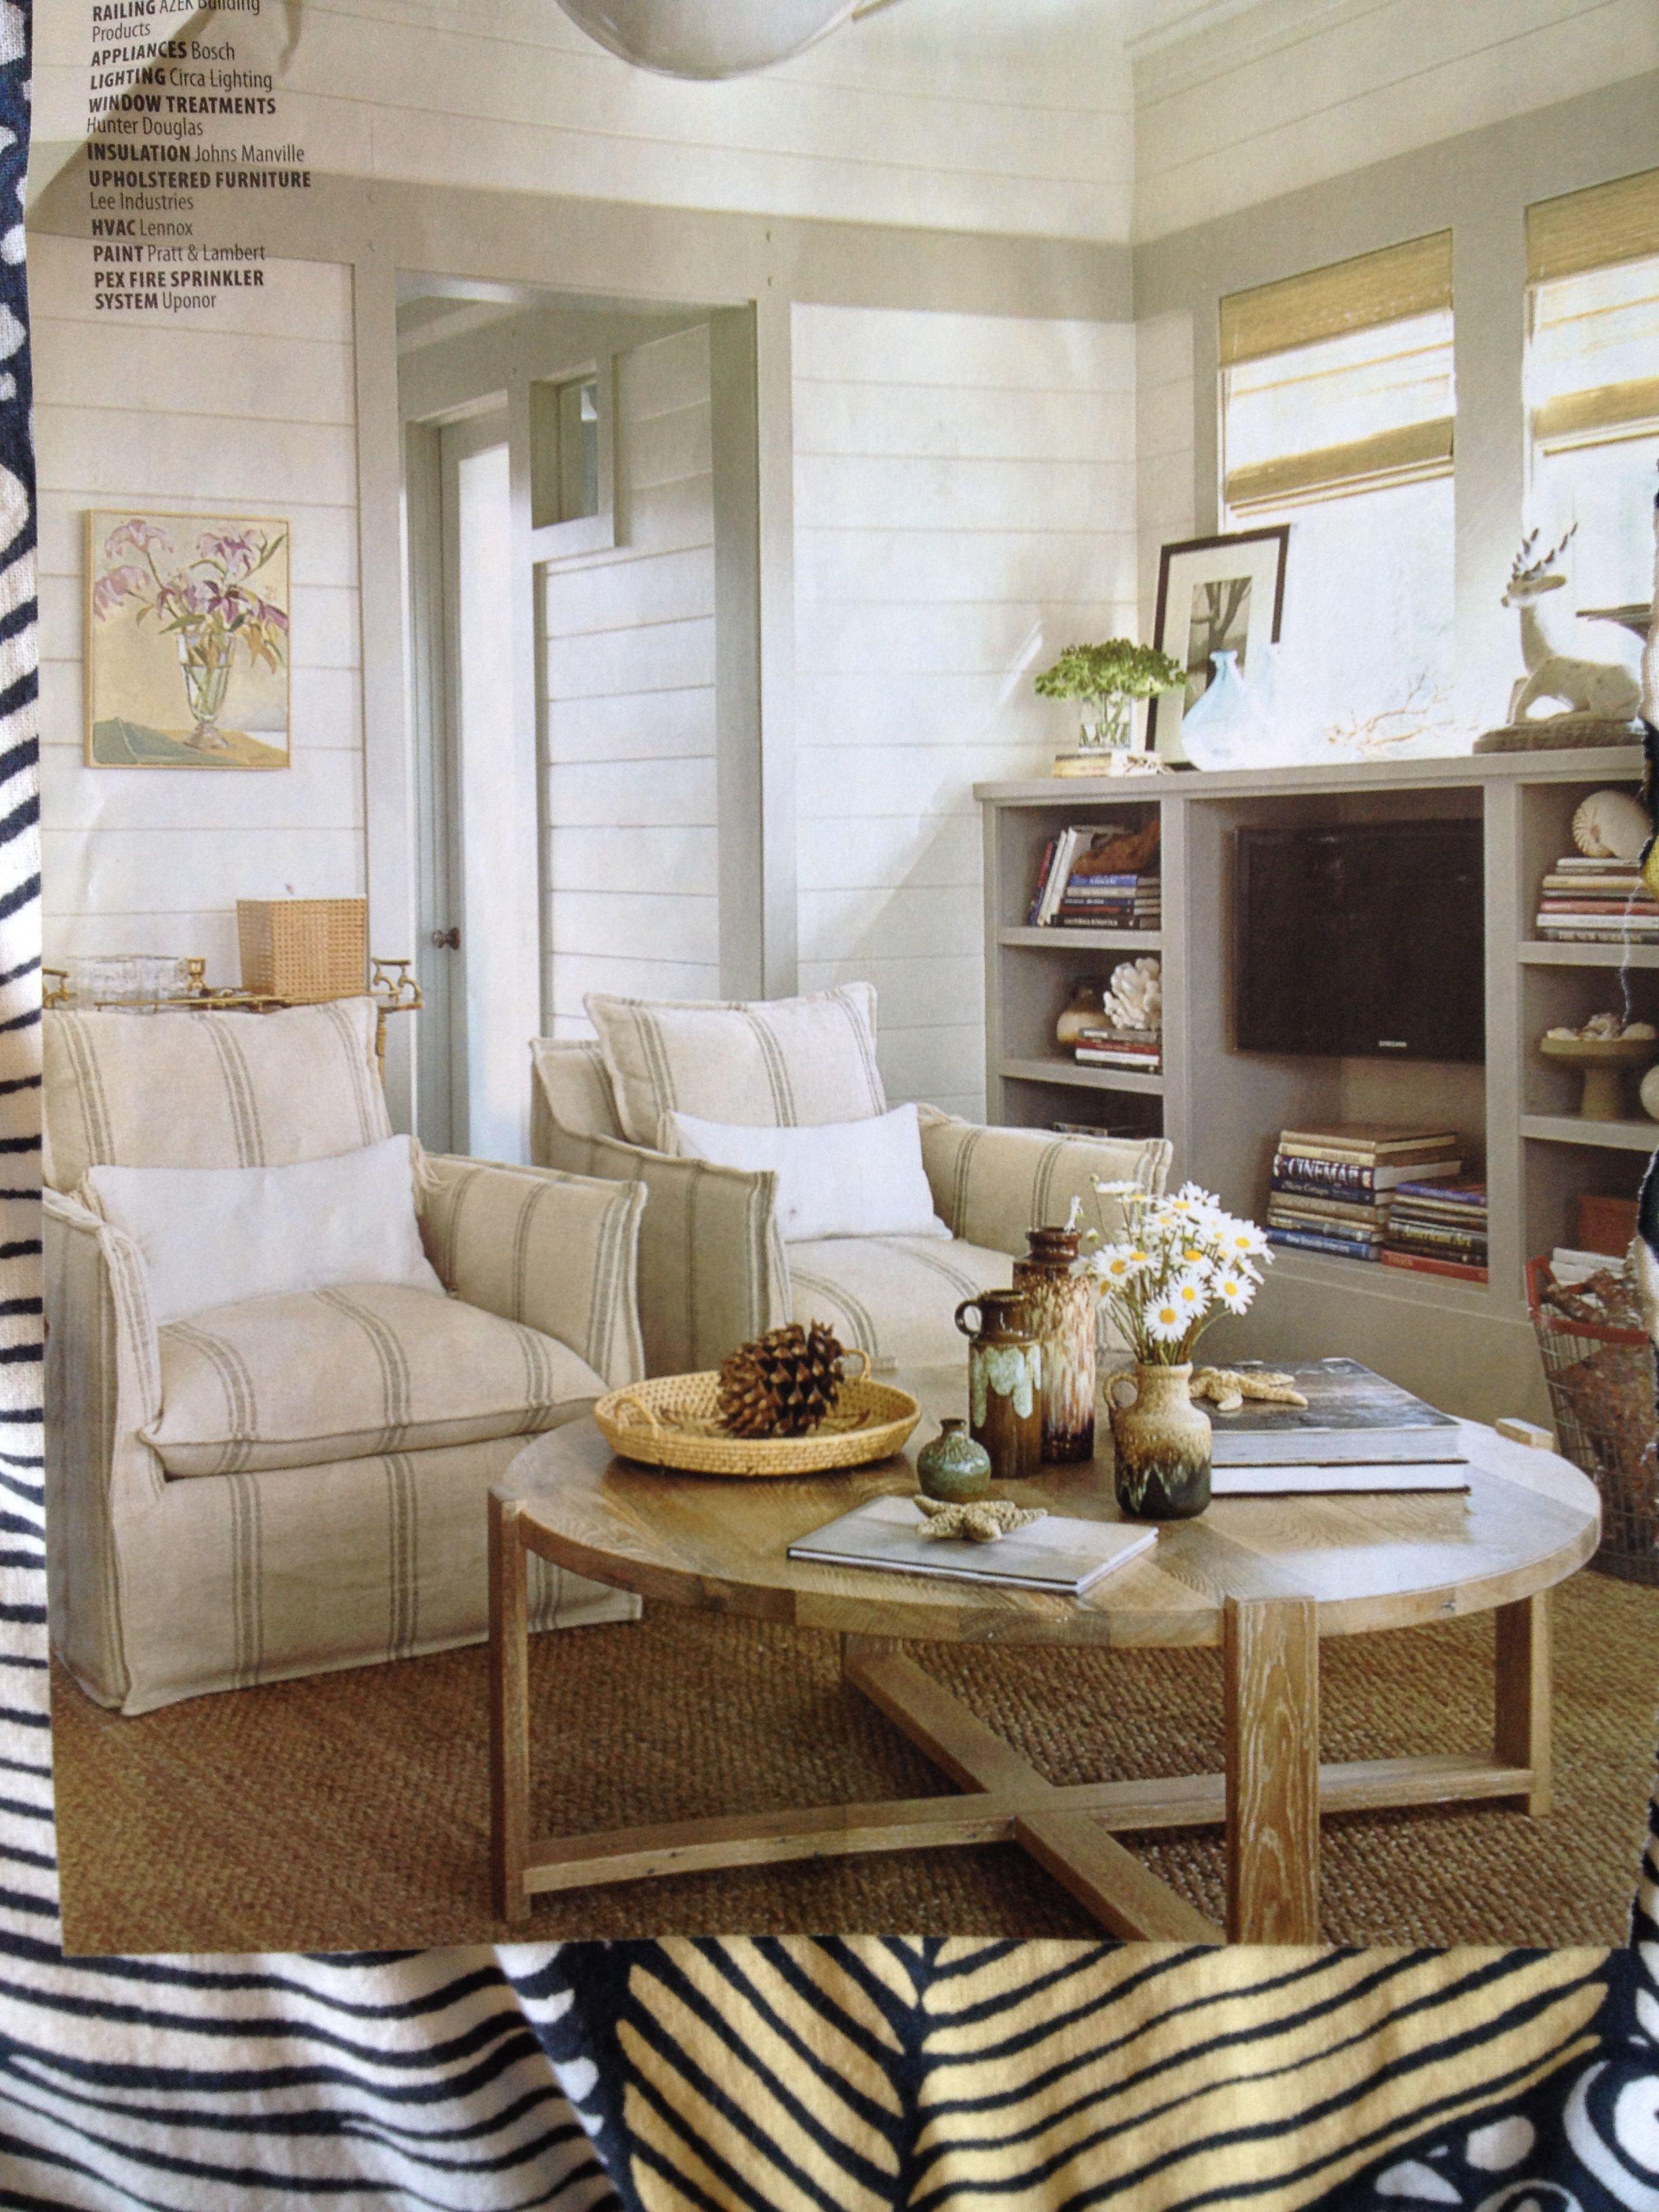 beach house home inspiration decorate ideas house coastal rh pinterest com